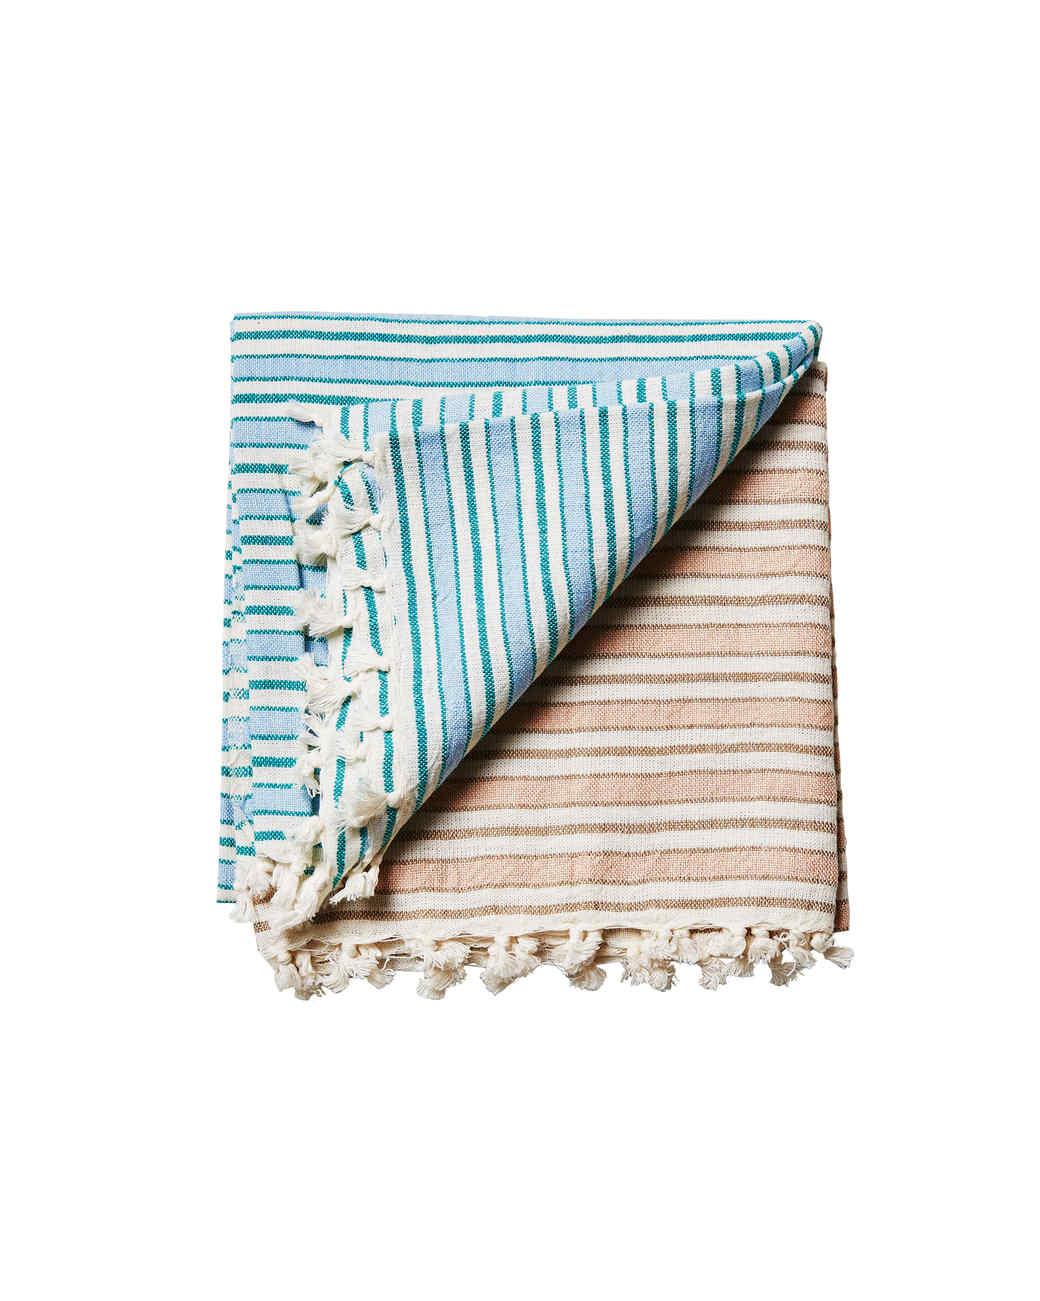 heather-taylor-tea-towels-118-d112856_l.jpg